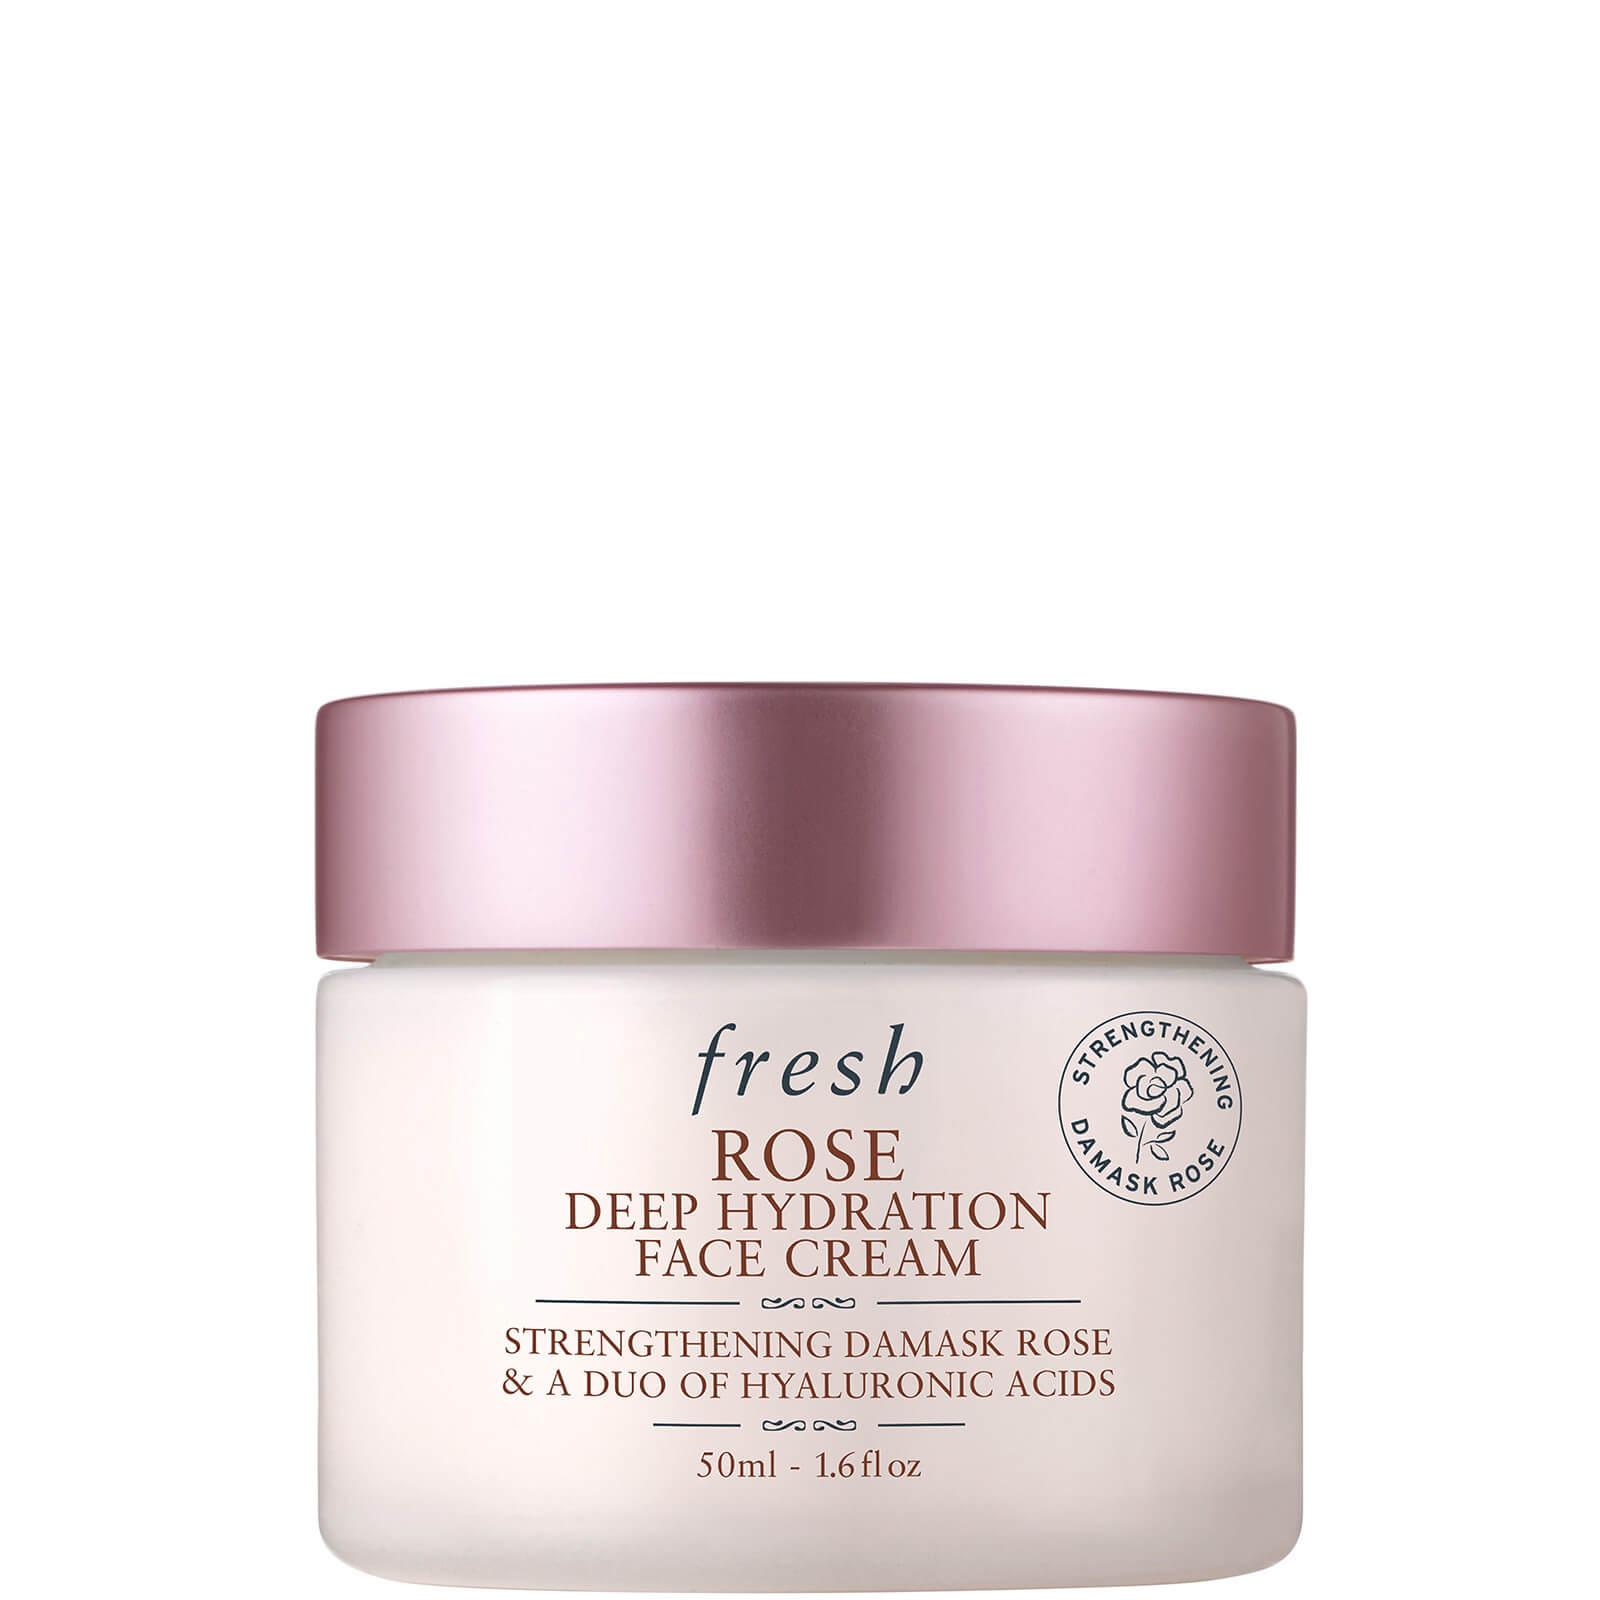 Купить Fresh Rose Deep Hydration Face Cream (Various Sizes) - 50ml